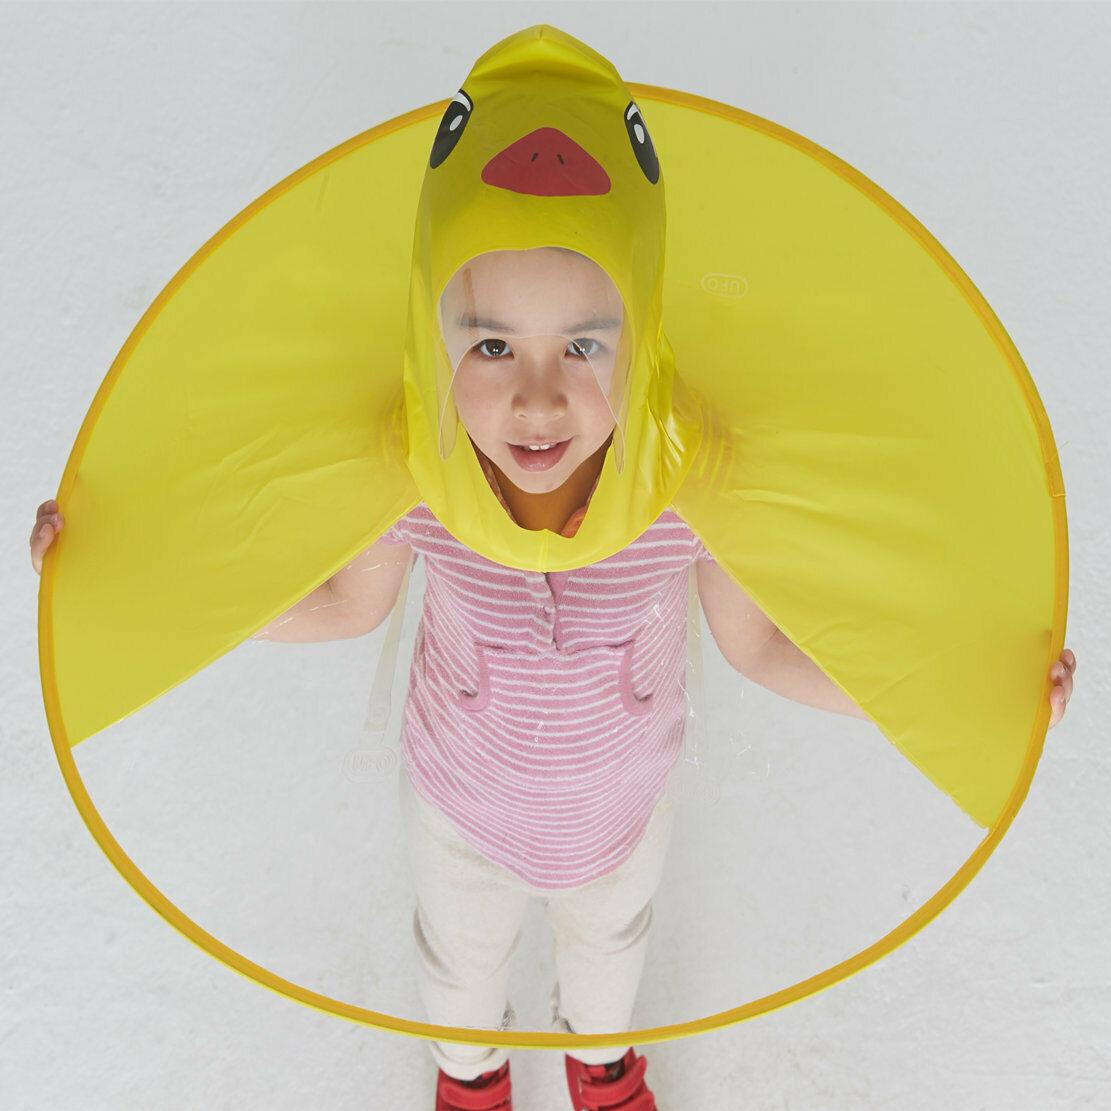 Girls Boys Cartoon Rain Coat Duck Kids Children Umbrella Hat Hooded Poncho c13.